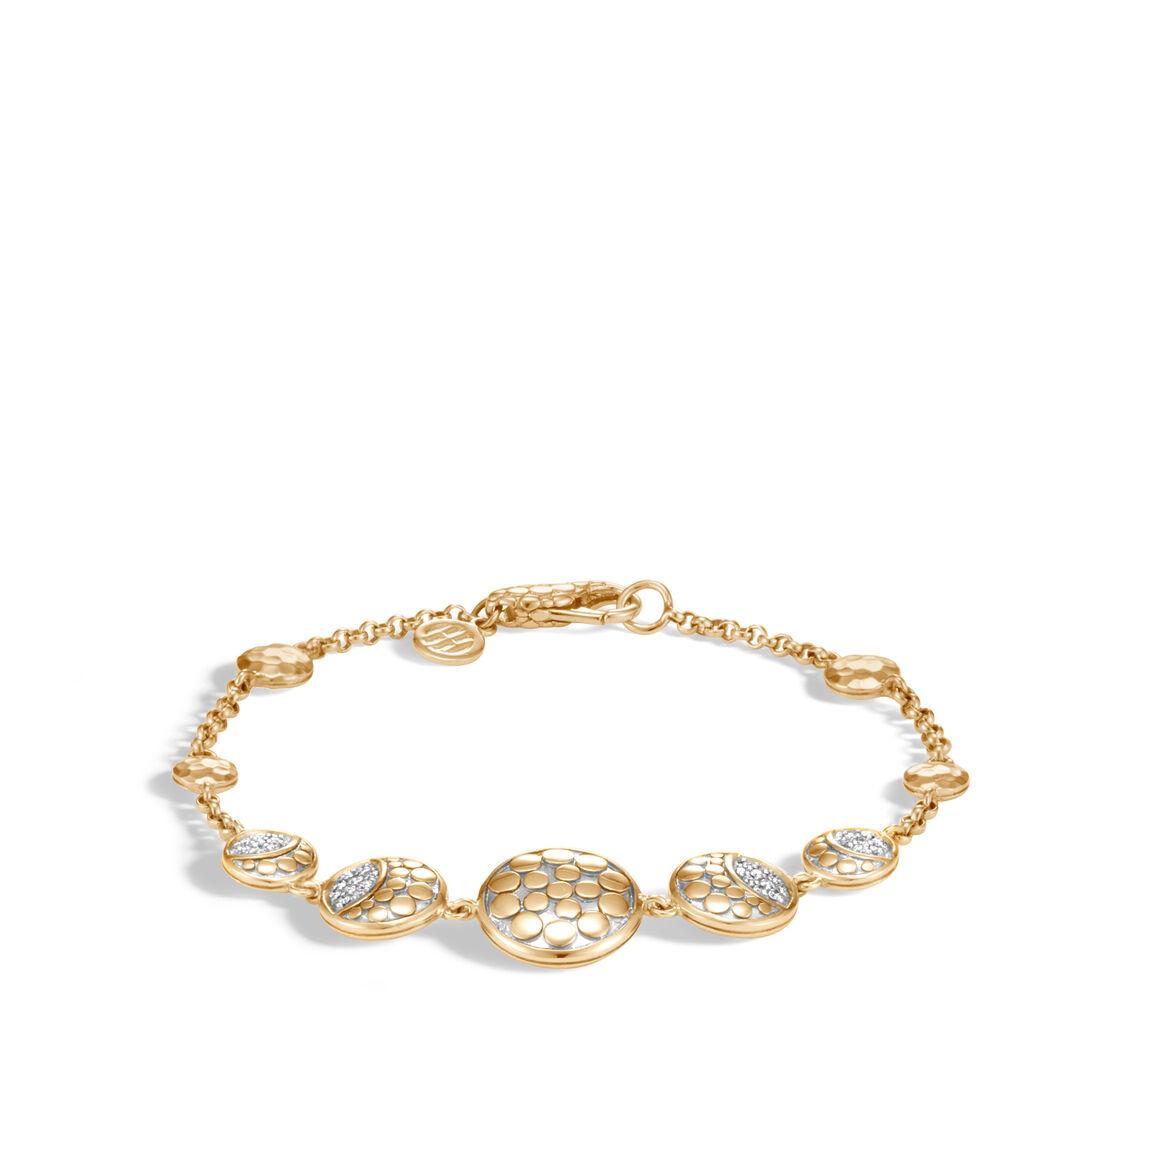 Dot Link Bracelet in Hammered 18K Gold with Diamonds